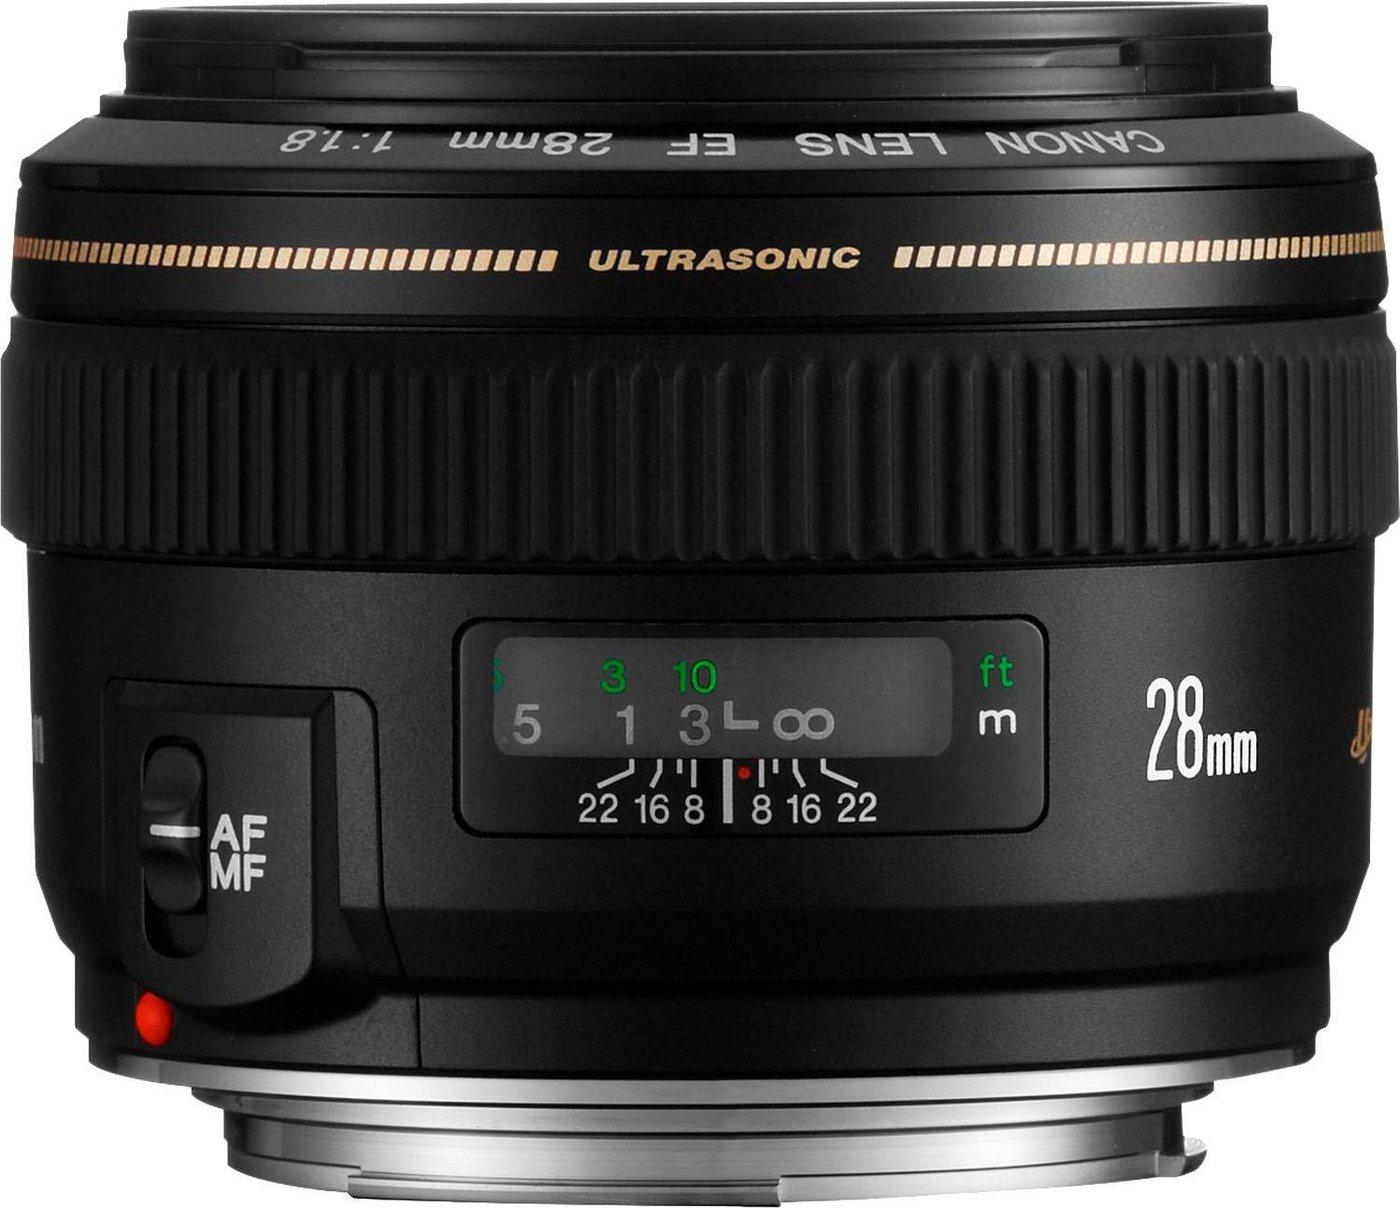 Objektive - Canon »EF28MM F1.8 USM« Weitwinkelobjektiv  - Onlineshop OTTO